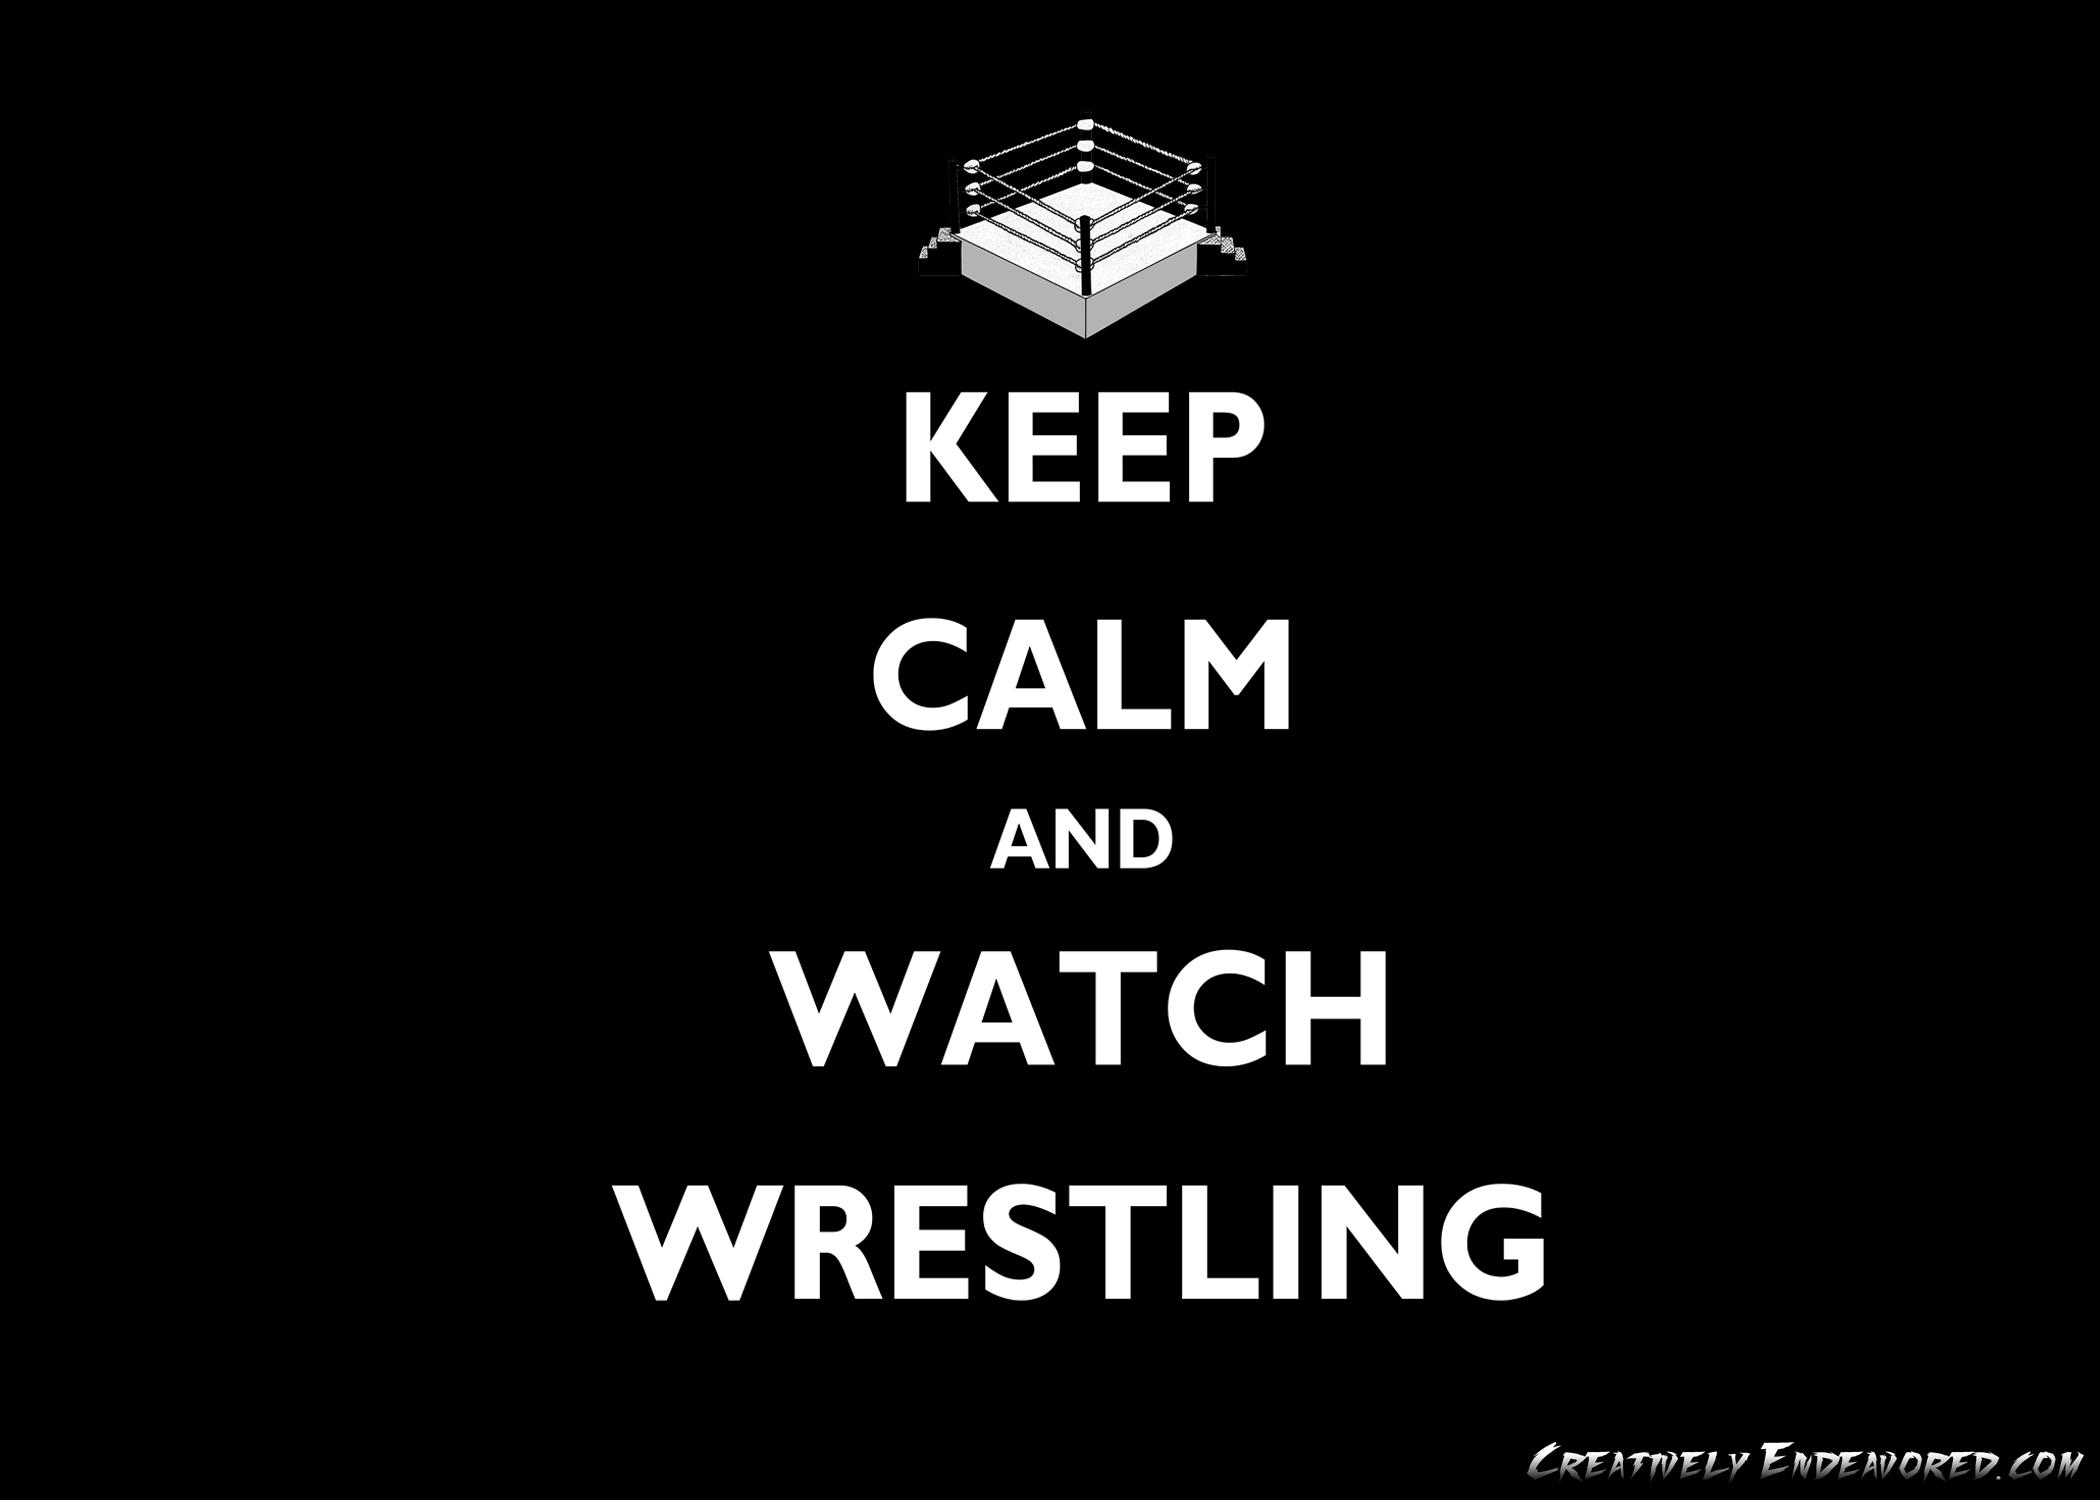 Greco Roman Wrestling Wallpaper Images Hdimagelib